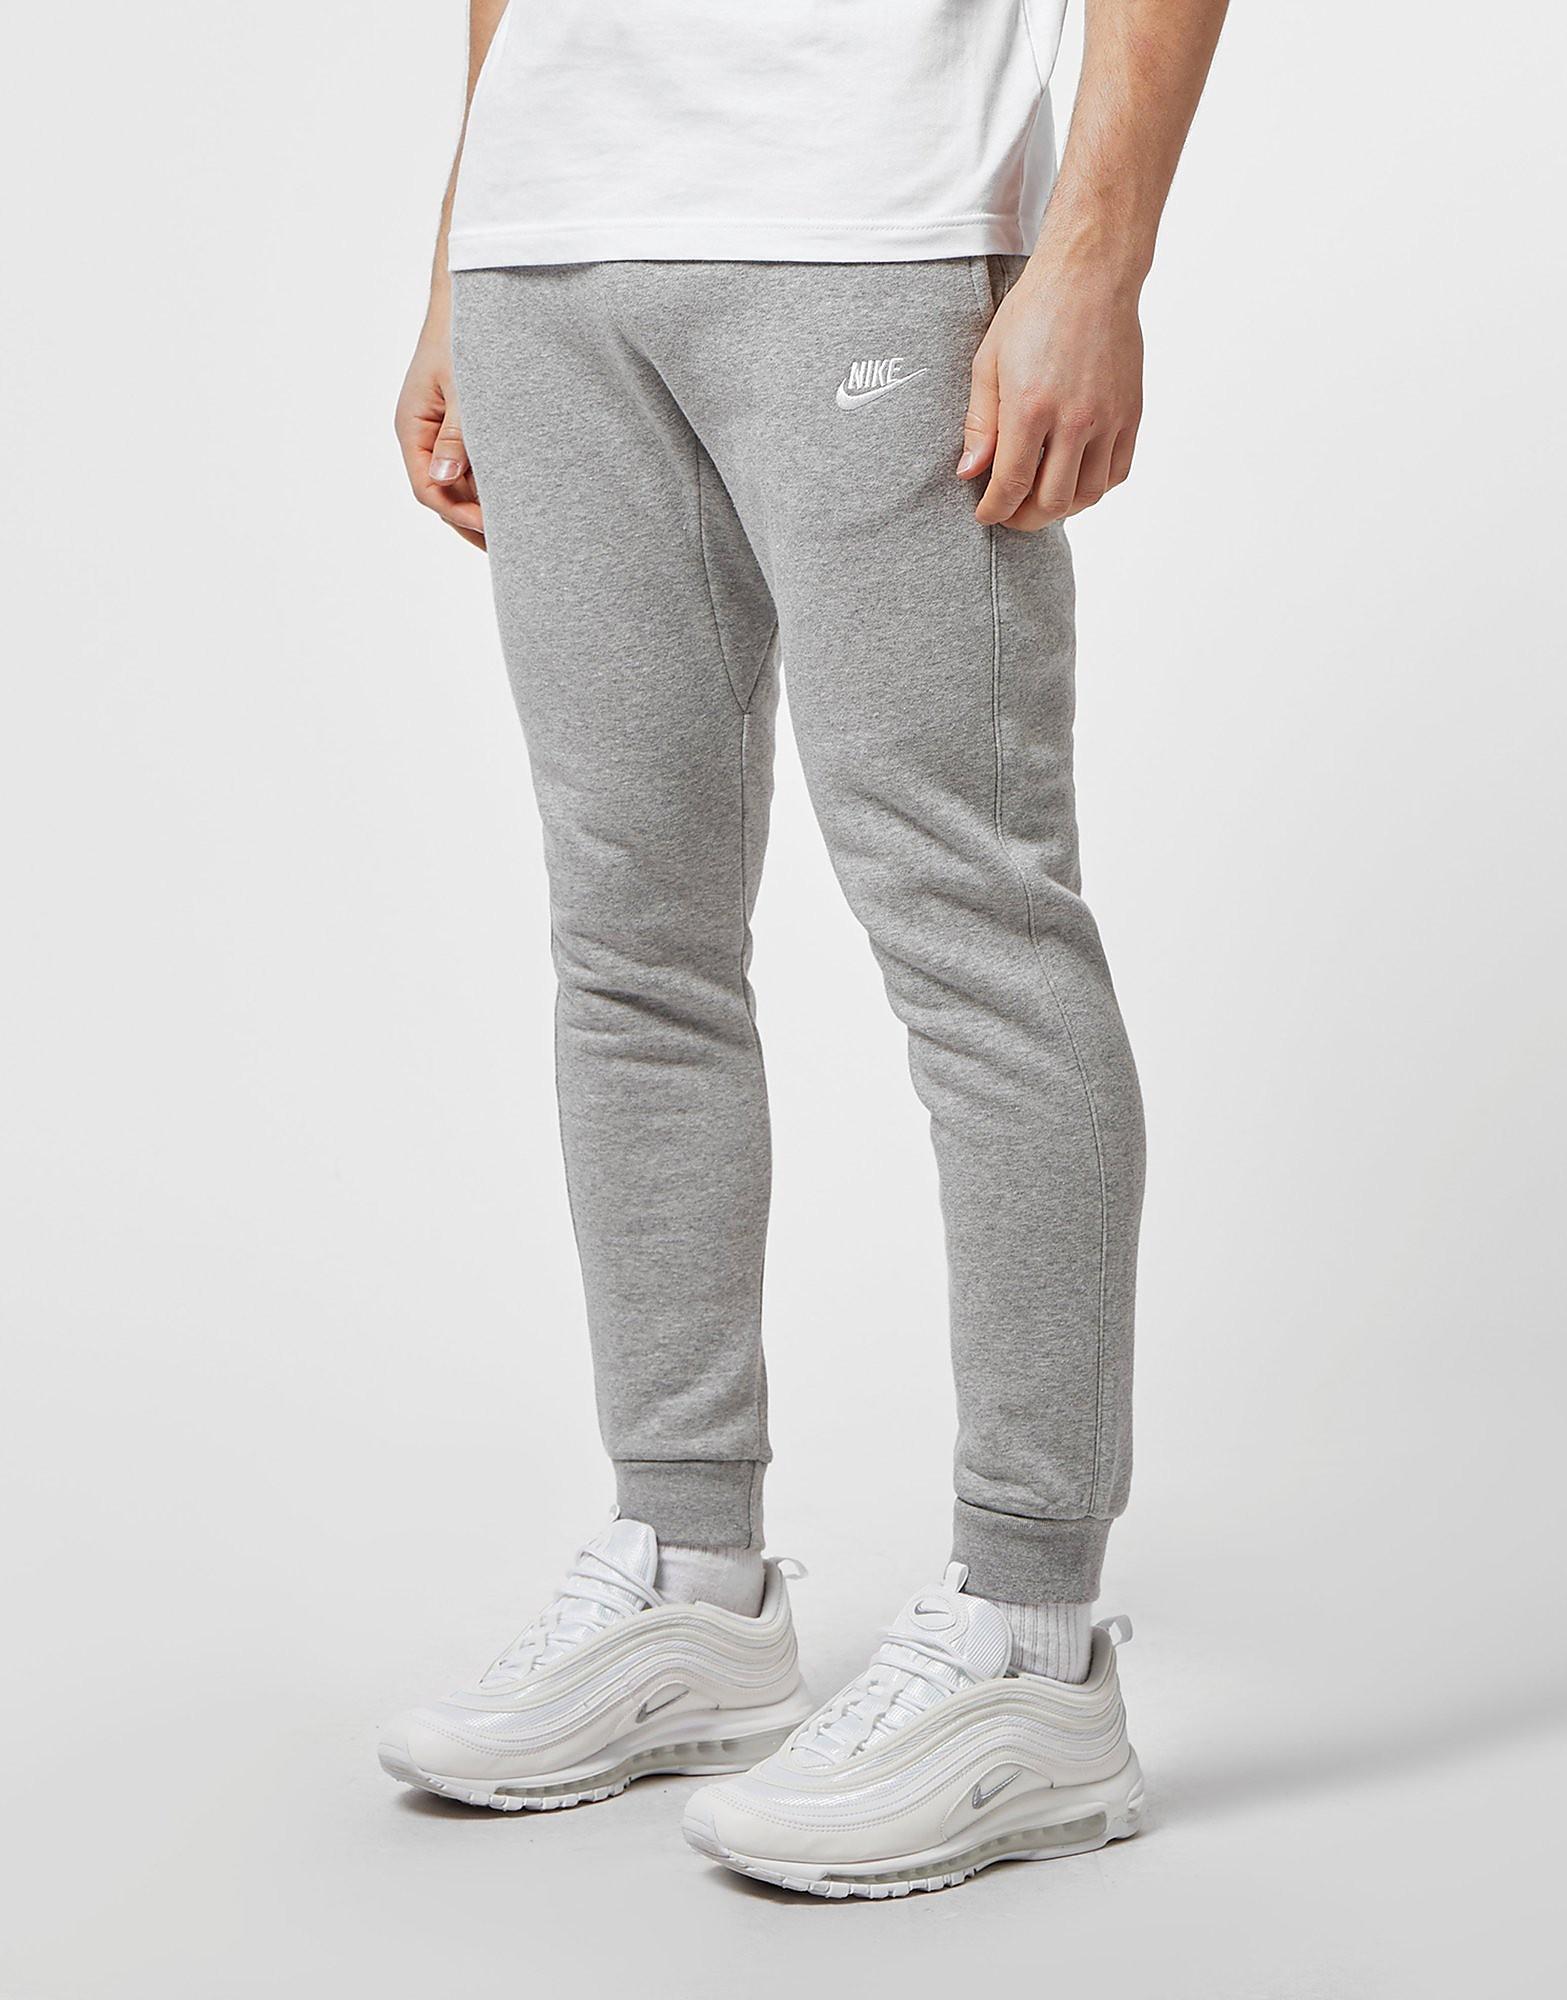 68d4d51bac30e Nike Foundation Cuffed Fleece Joggers - Grey, Grey - £40.00 - Bullring &  Grand Central